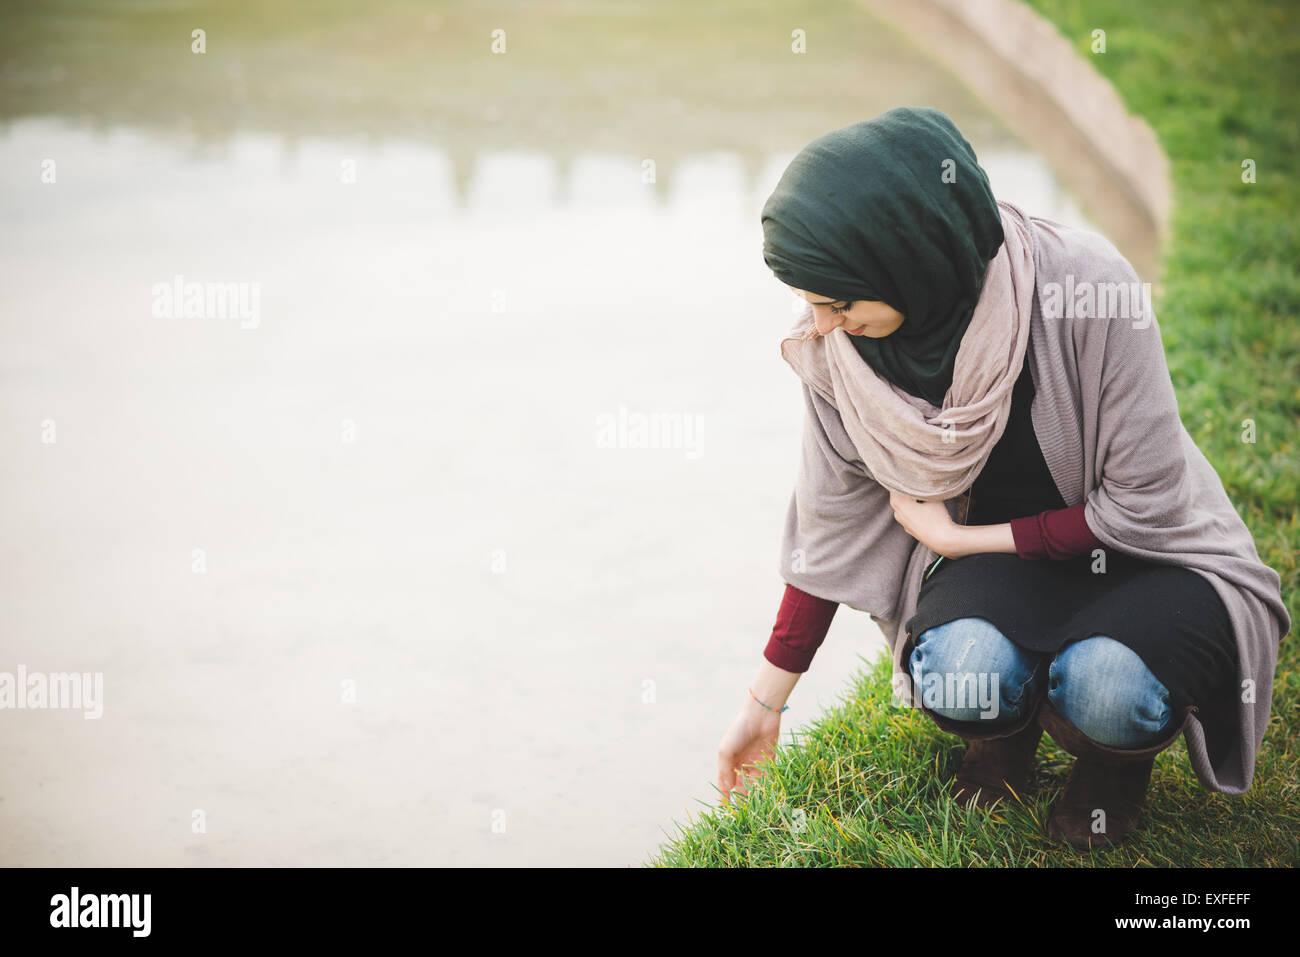 Young woman wearing hijab crouching next to park lake - Stock Image